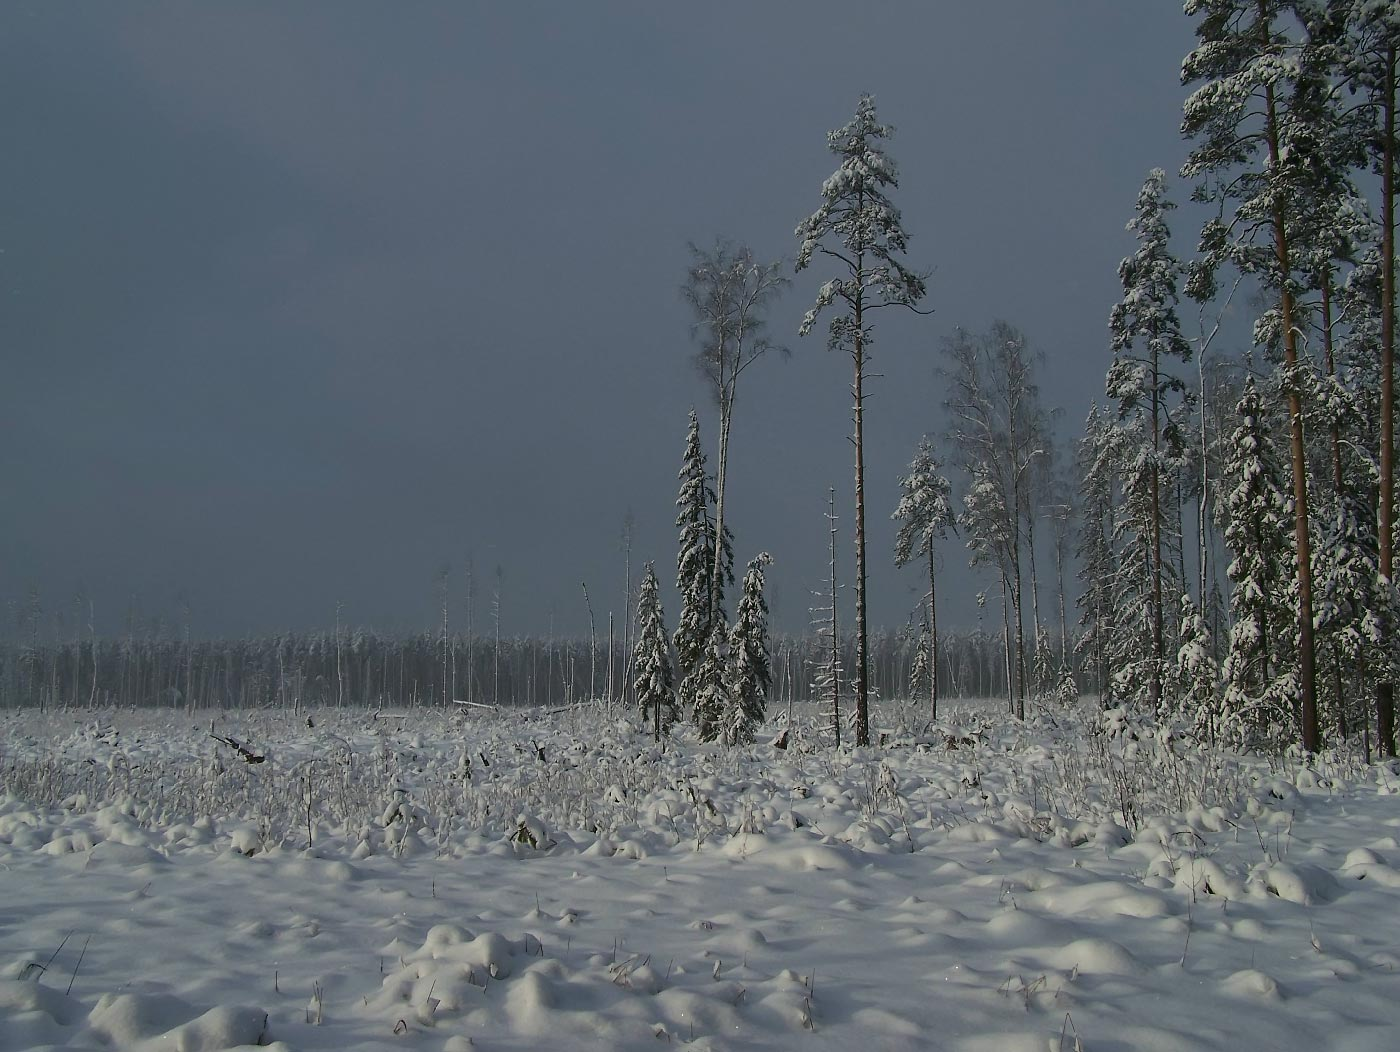 зима, снег, Вячеслав Довыденков